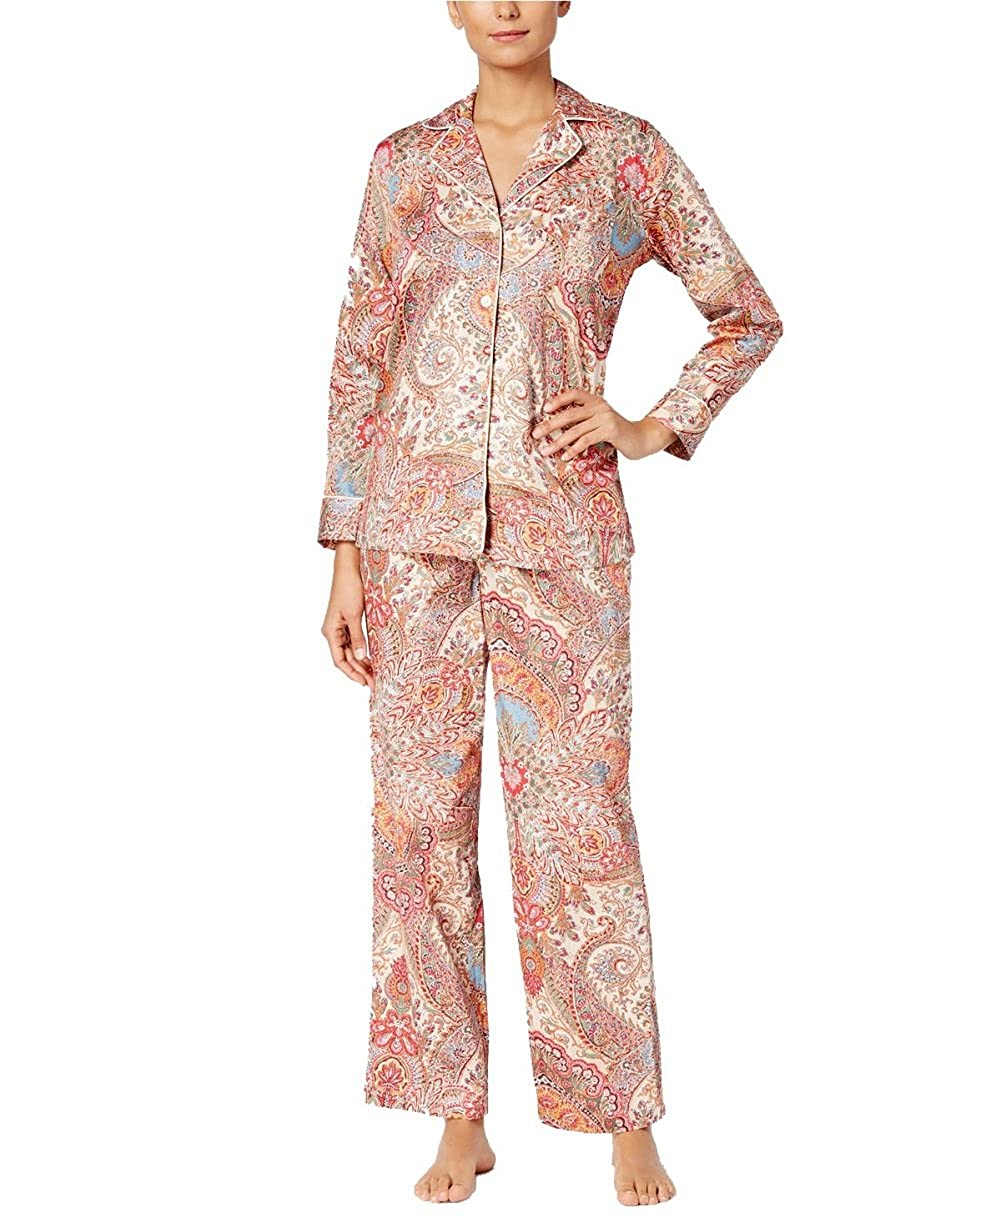 d9448e50e15 Lauren Ralph Lauren Women's Gilded Age Printed Sateen Pajama Set- Med at Amazon  Women's Clothing store: